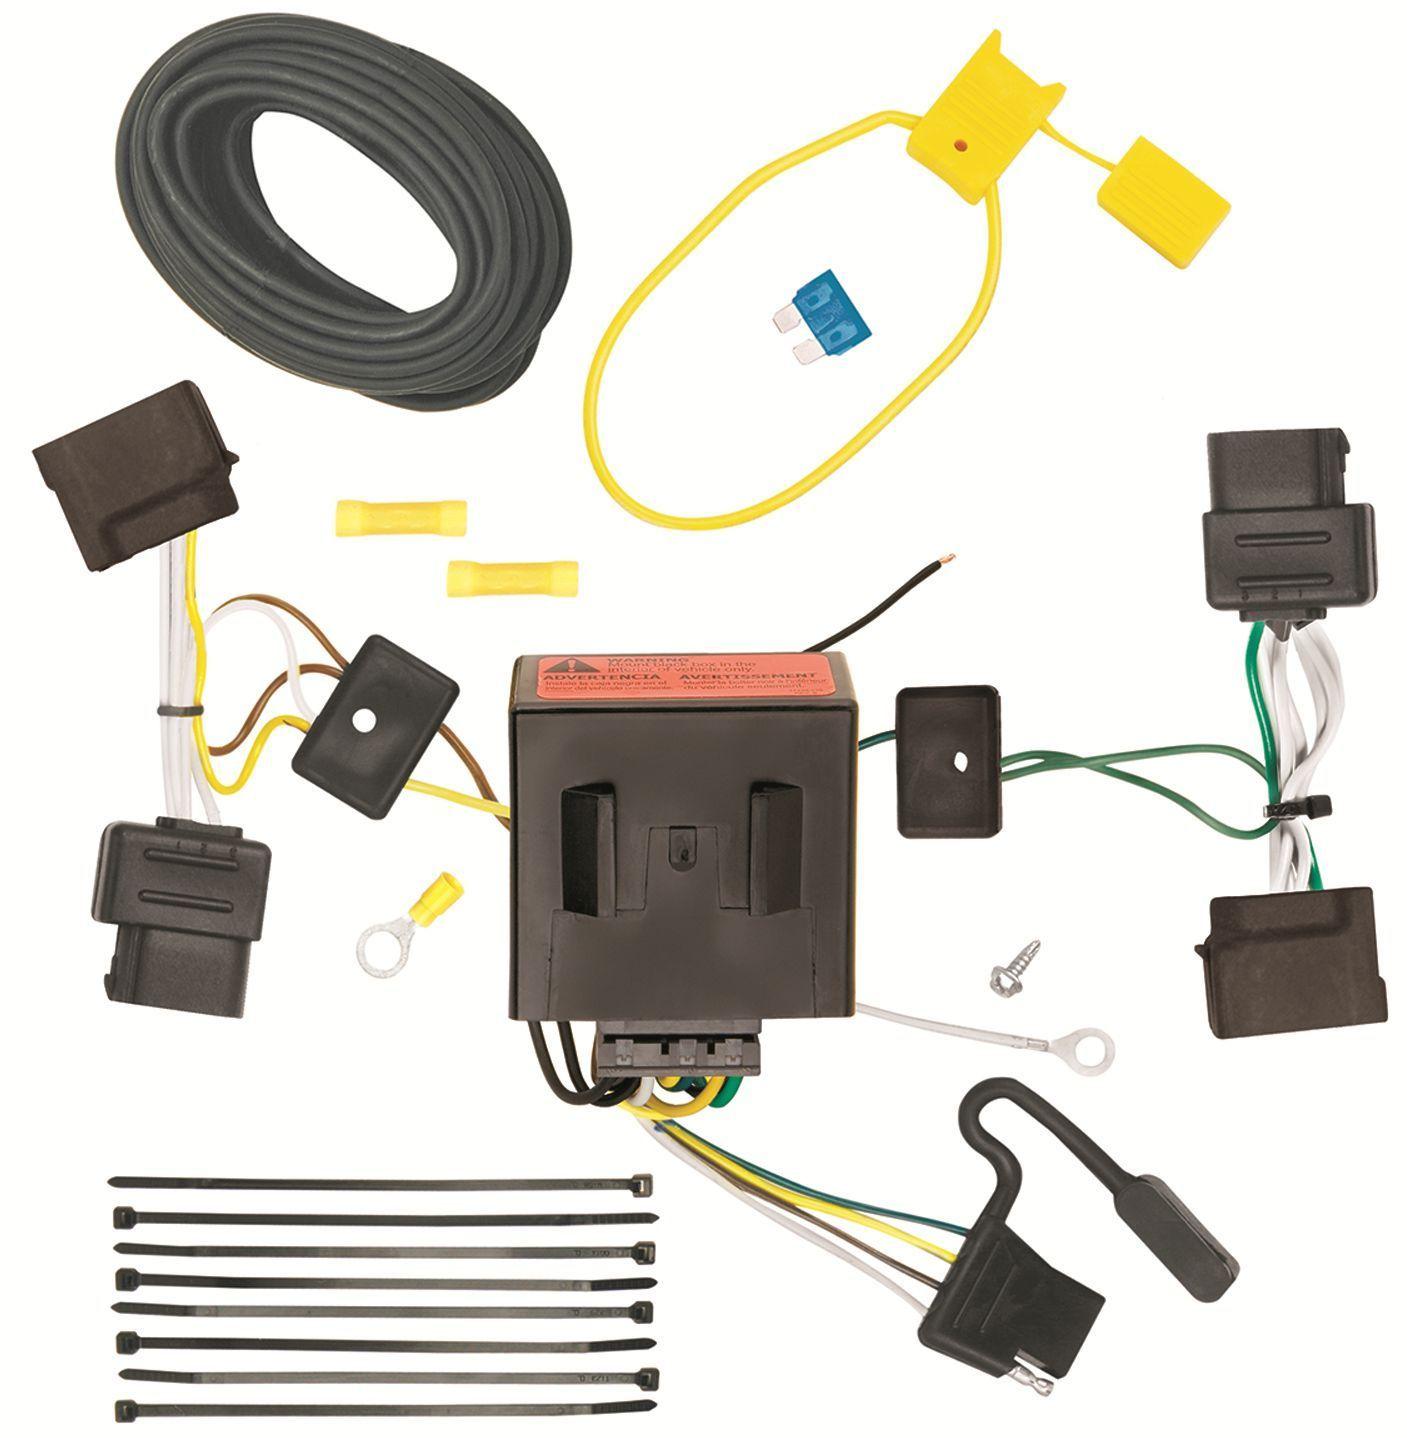 2008 2014 ford e 150 250 350 trailer hitch wiring kit. Black Bedroom Furniture Sets. Home Design Ideas